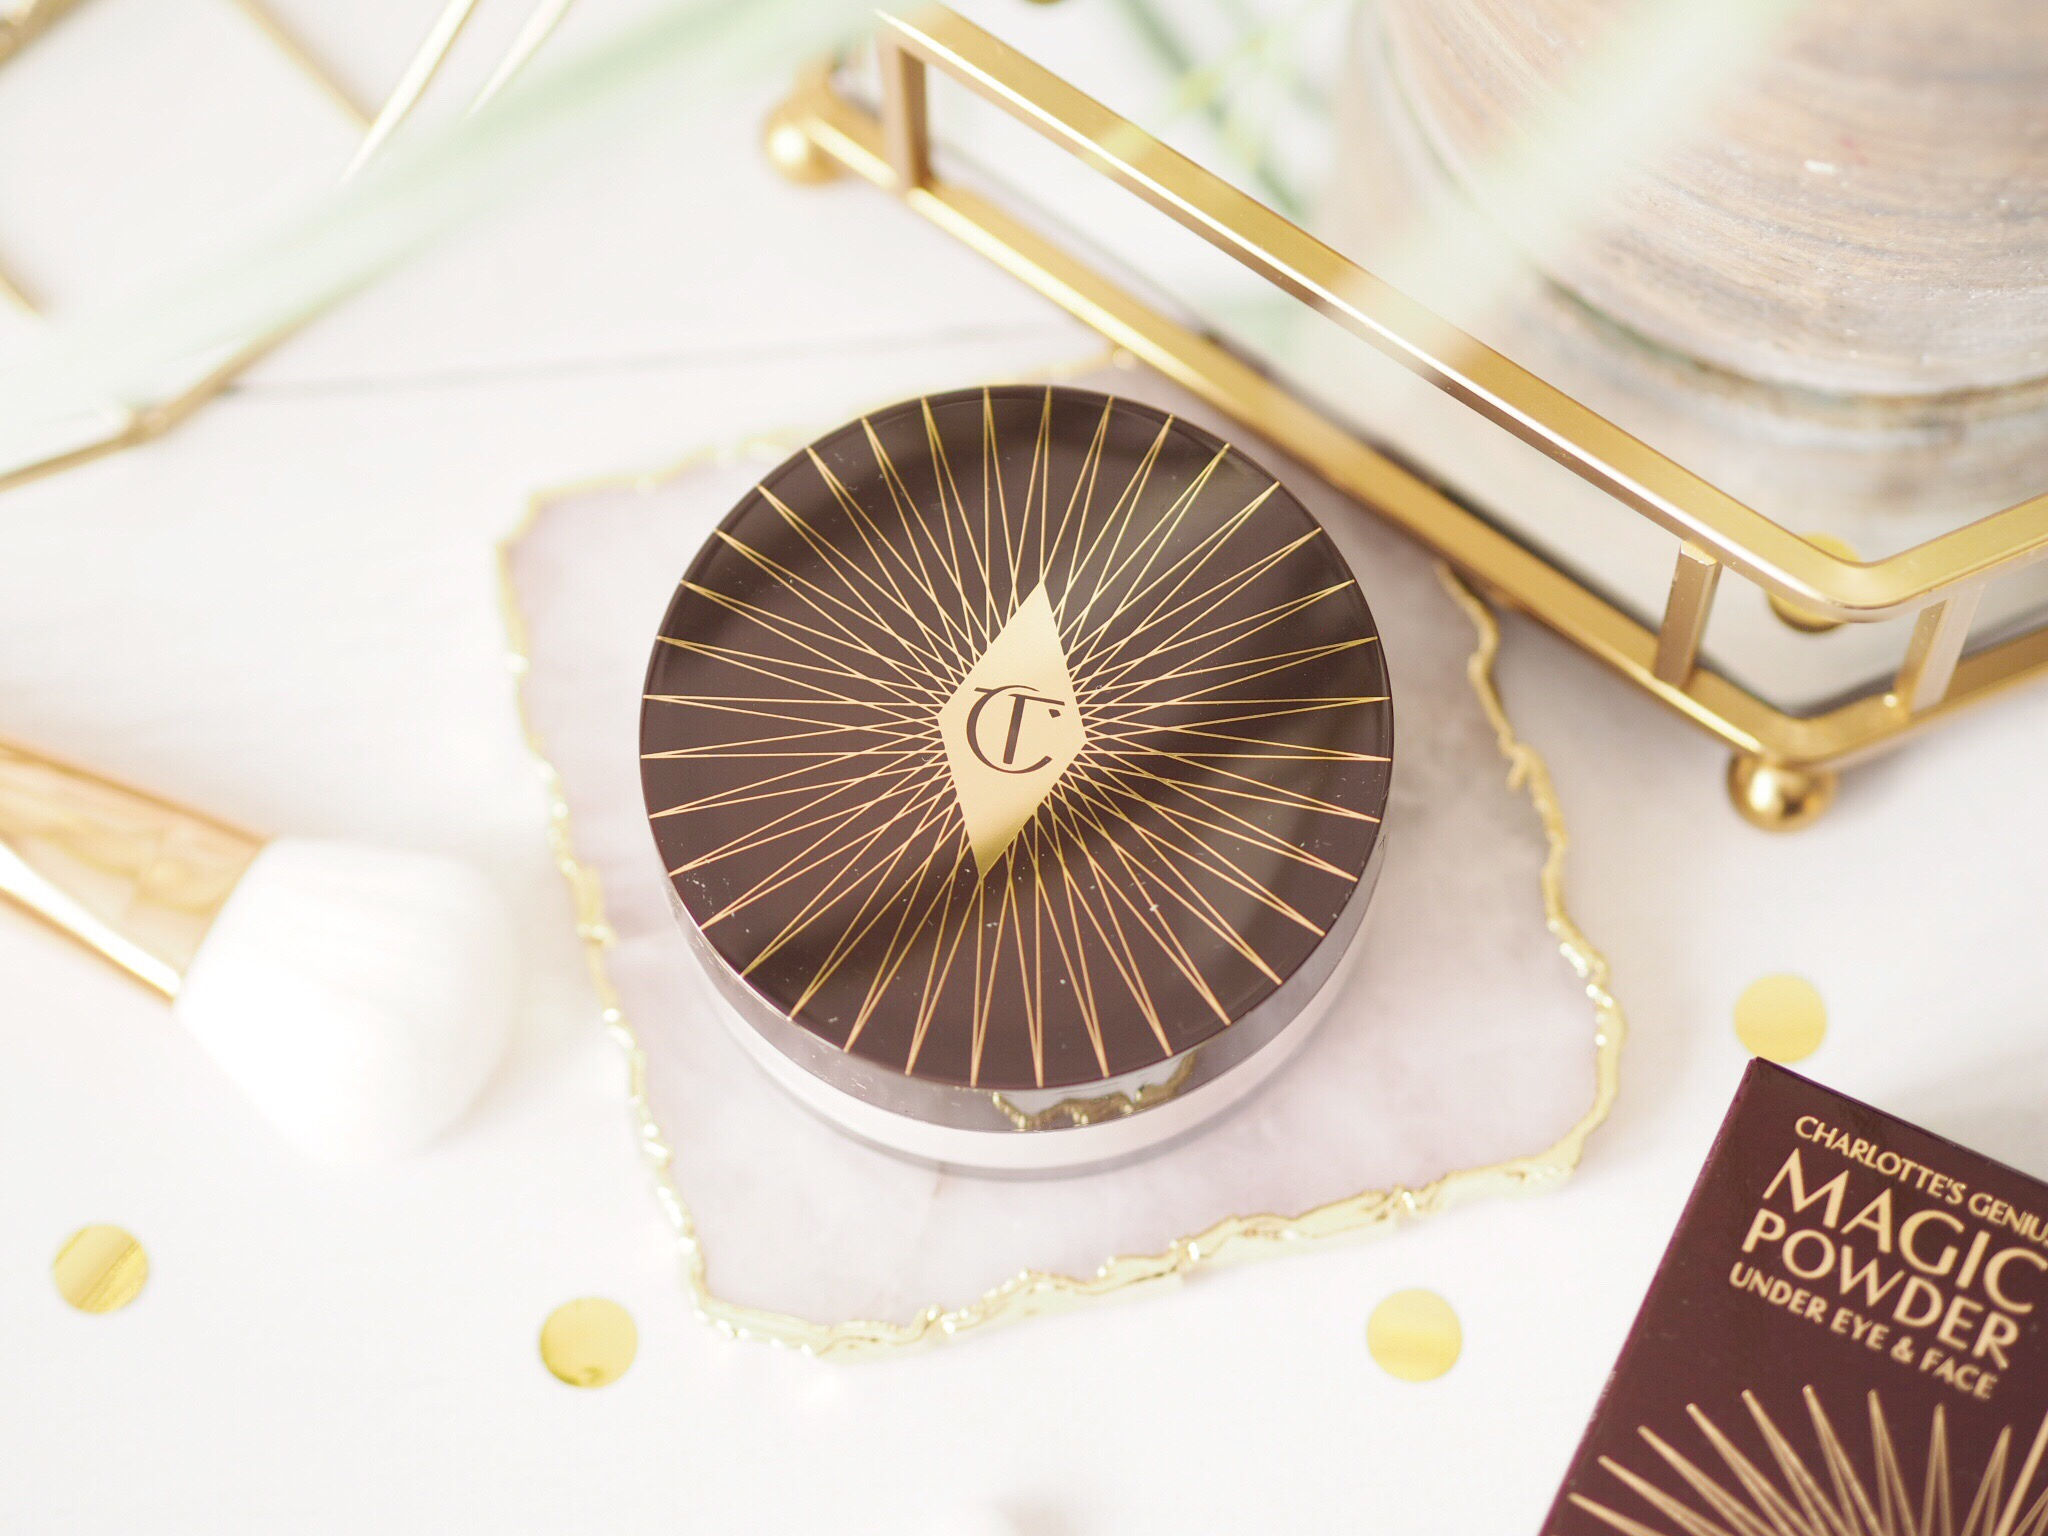 Charlotte Tilbury Genius Magic Powder Review